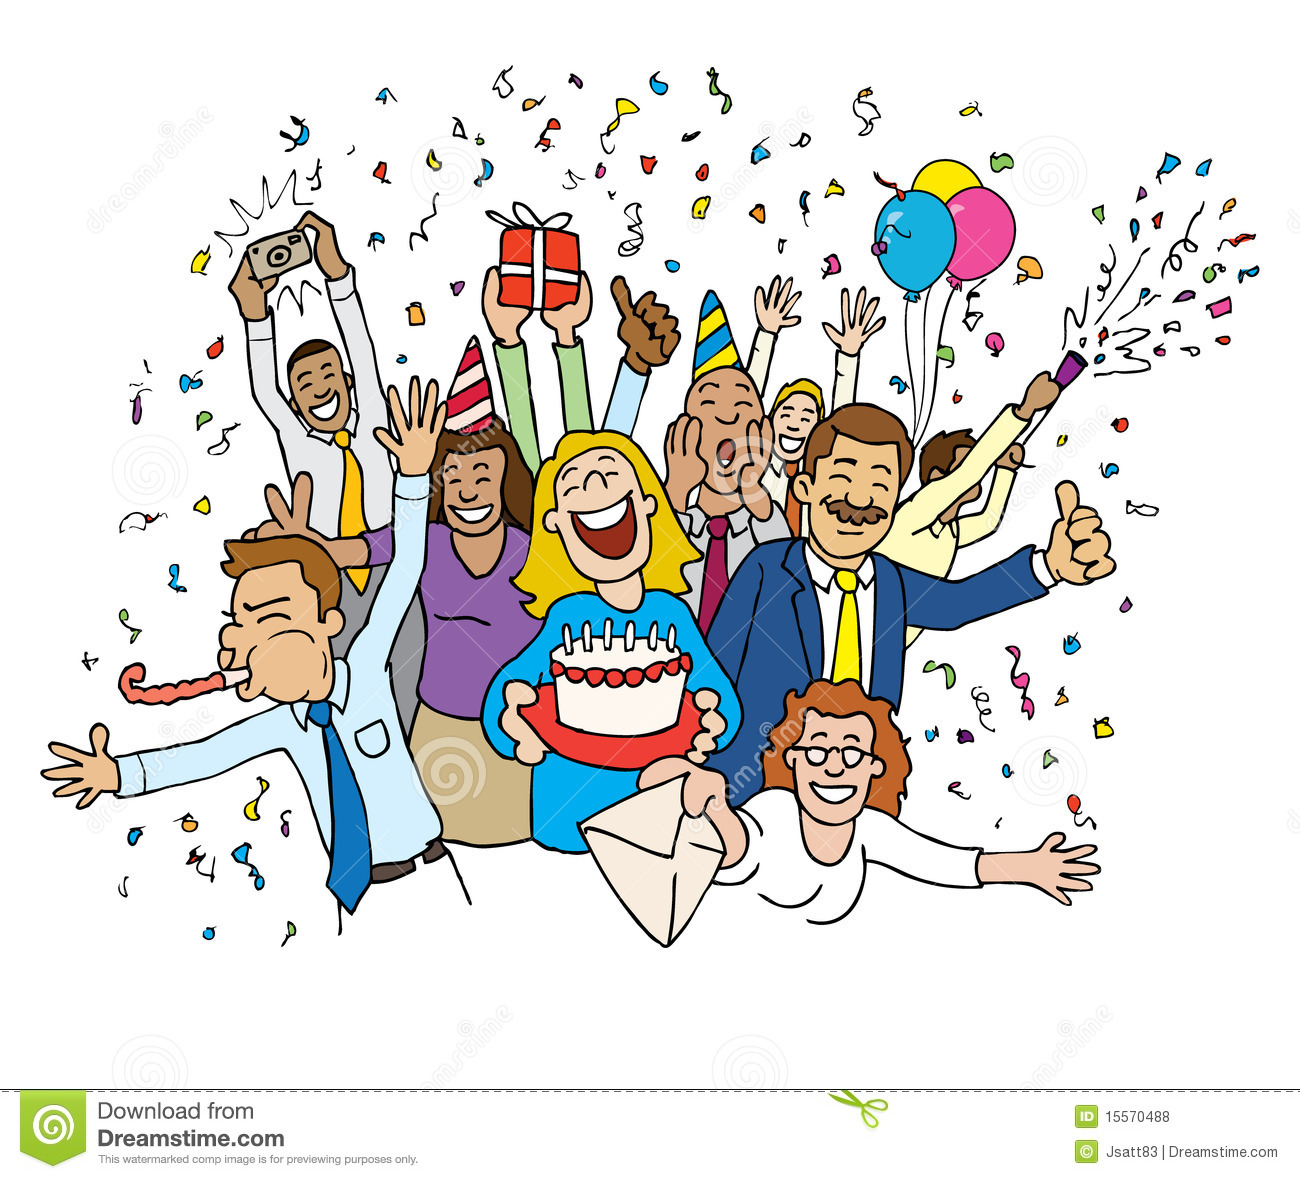 Clipart feiern kostenlos banner royalty free library Clipart feiern kostenlos - ClipartFest banner royalty free library